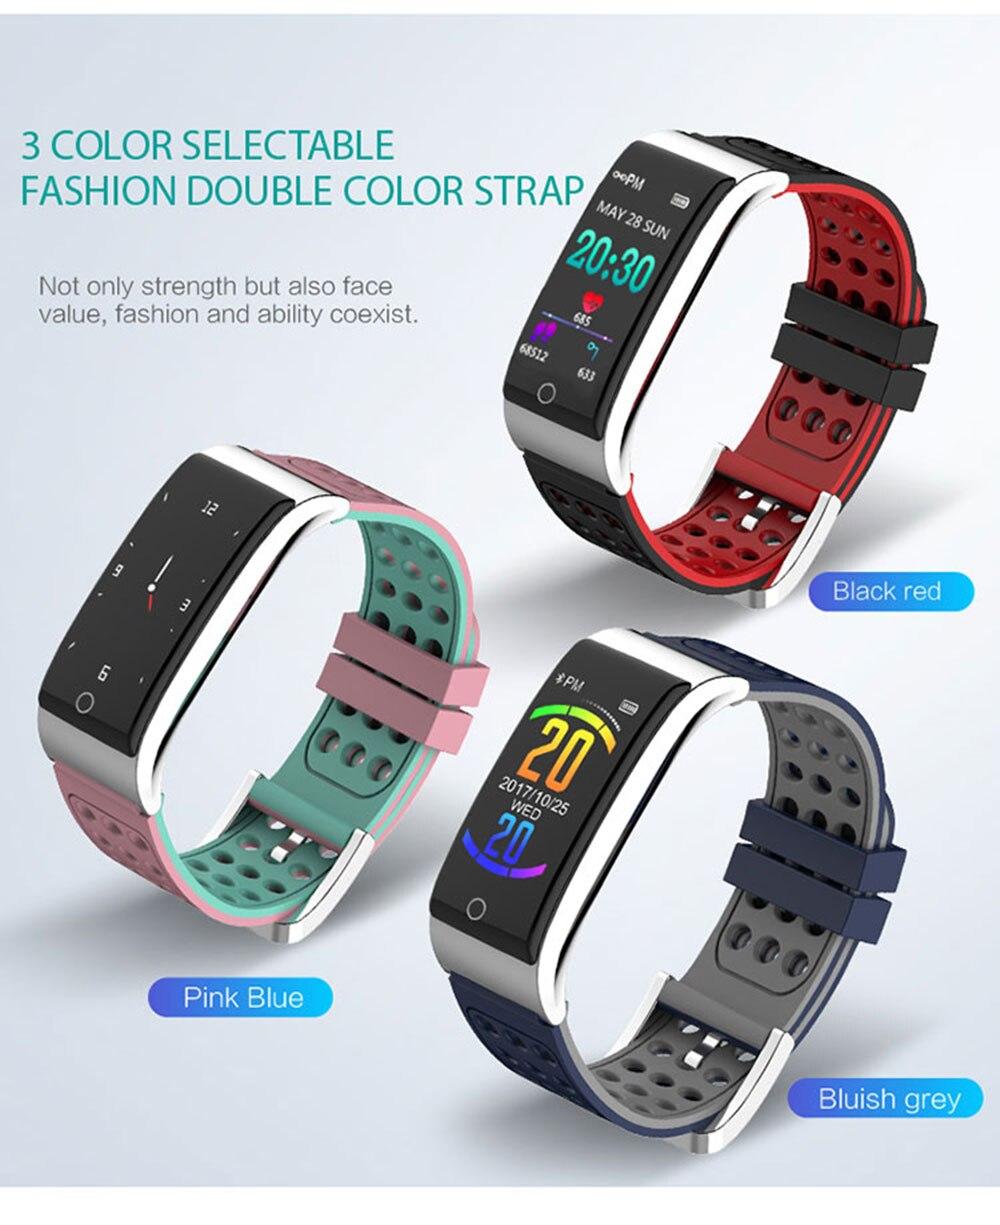 02_03-130380-smart bracelet-